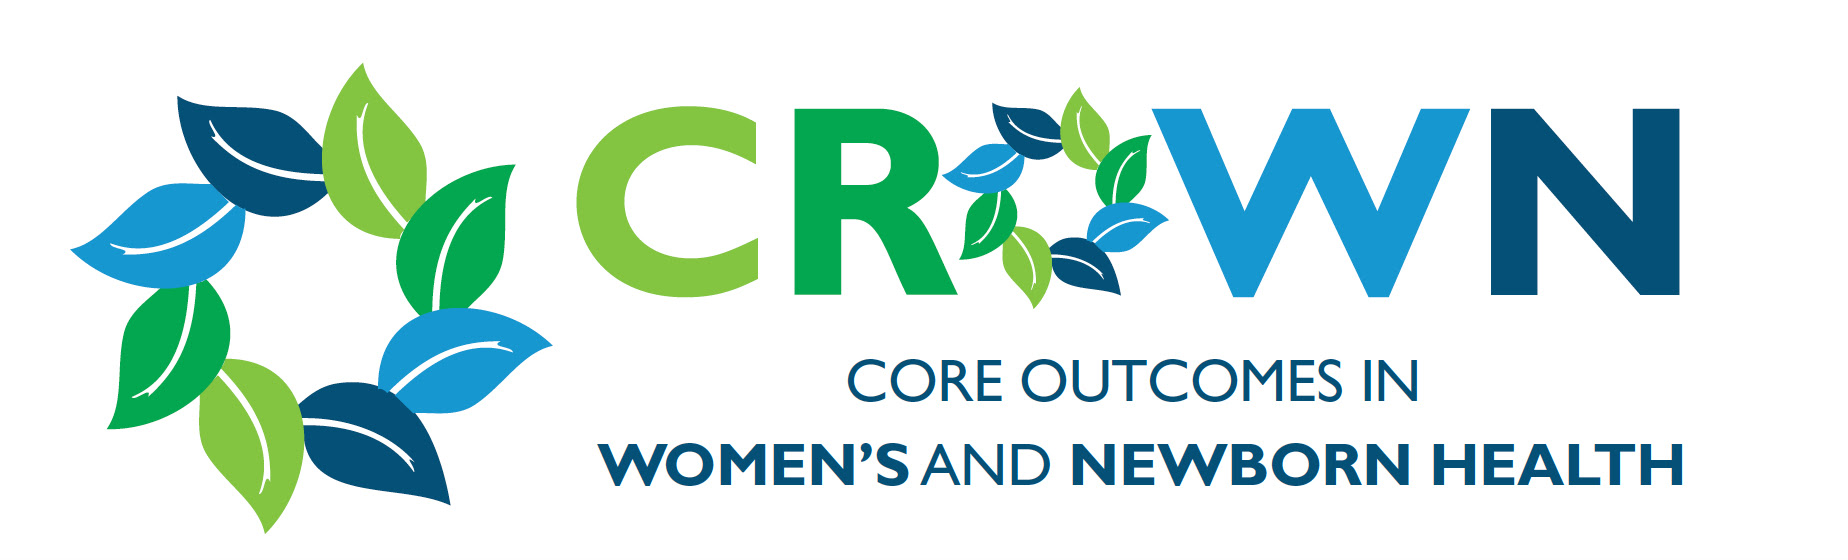 http://www.crown-initiative.org/wp-content/uploads/2016/02/logo-feb-2016.jpg